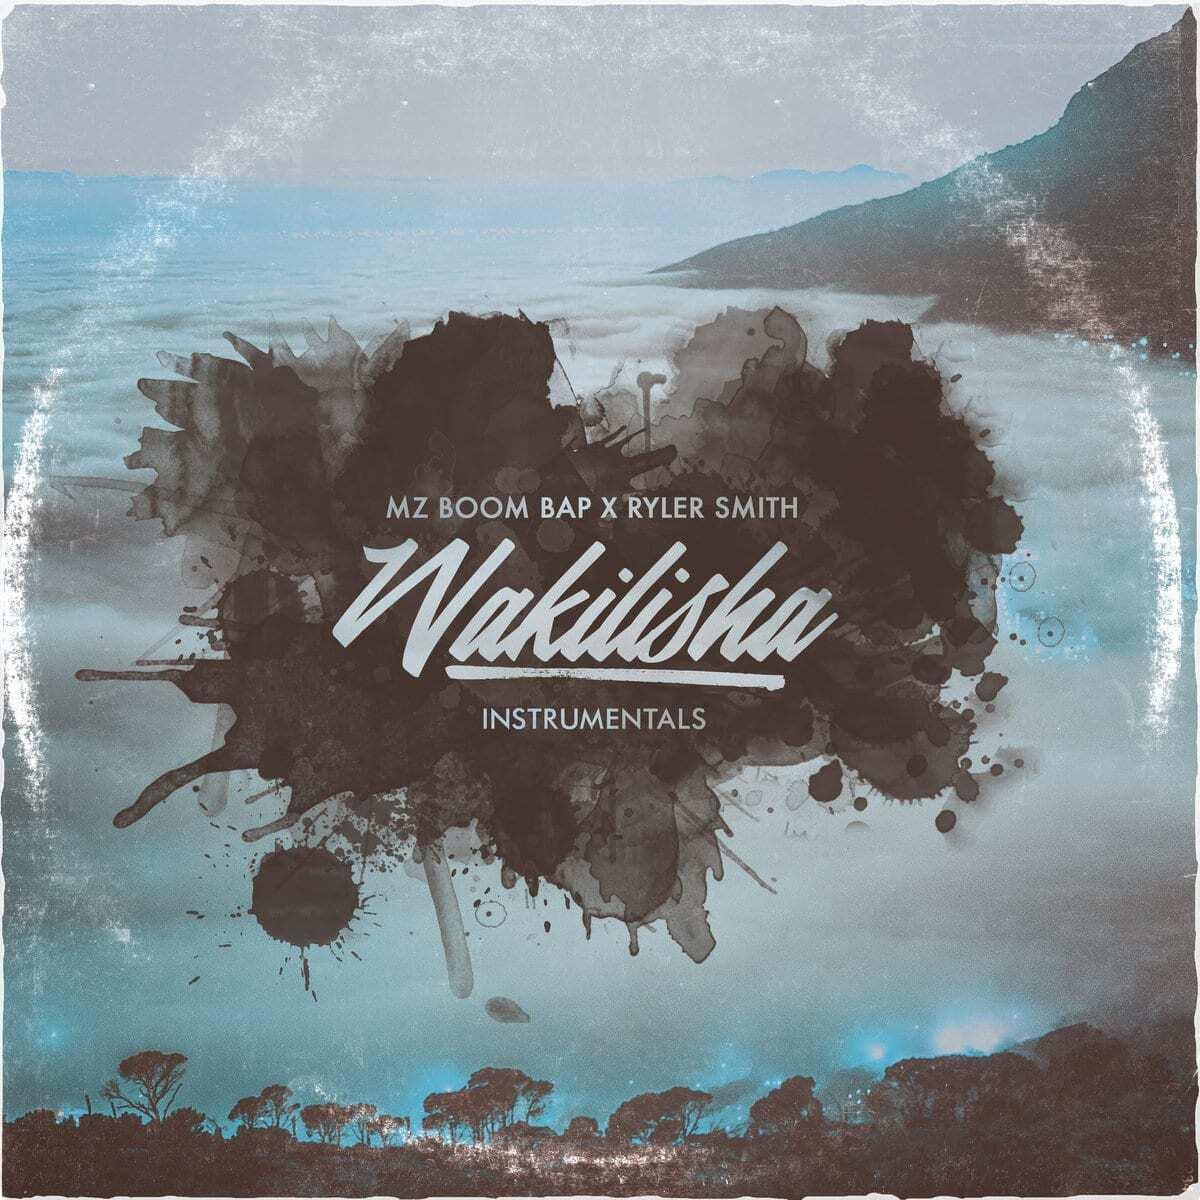 MZ Boom Bap & Ryler Smith - Wakilisha - Instrumentals - VinDig